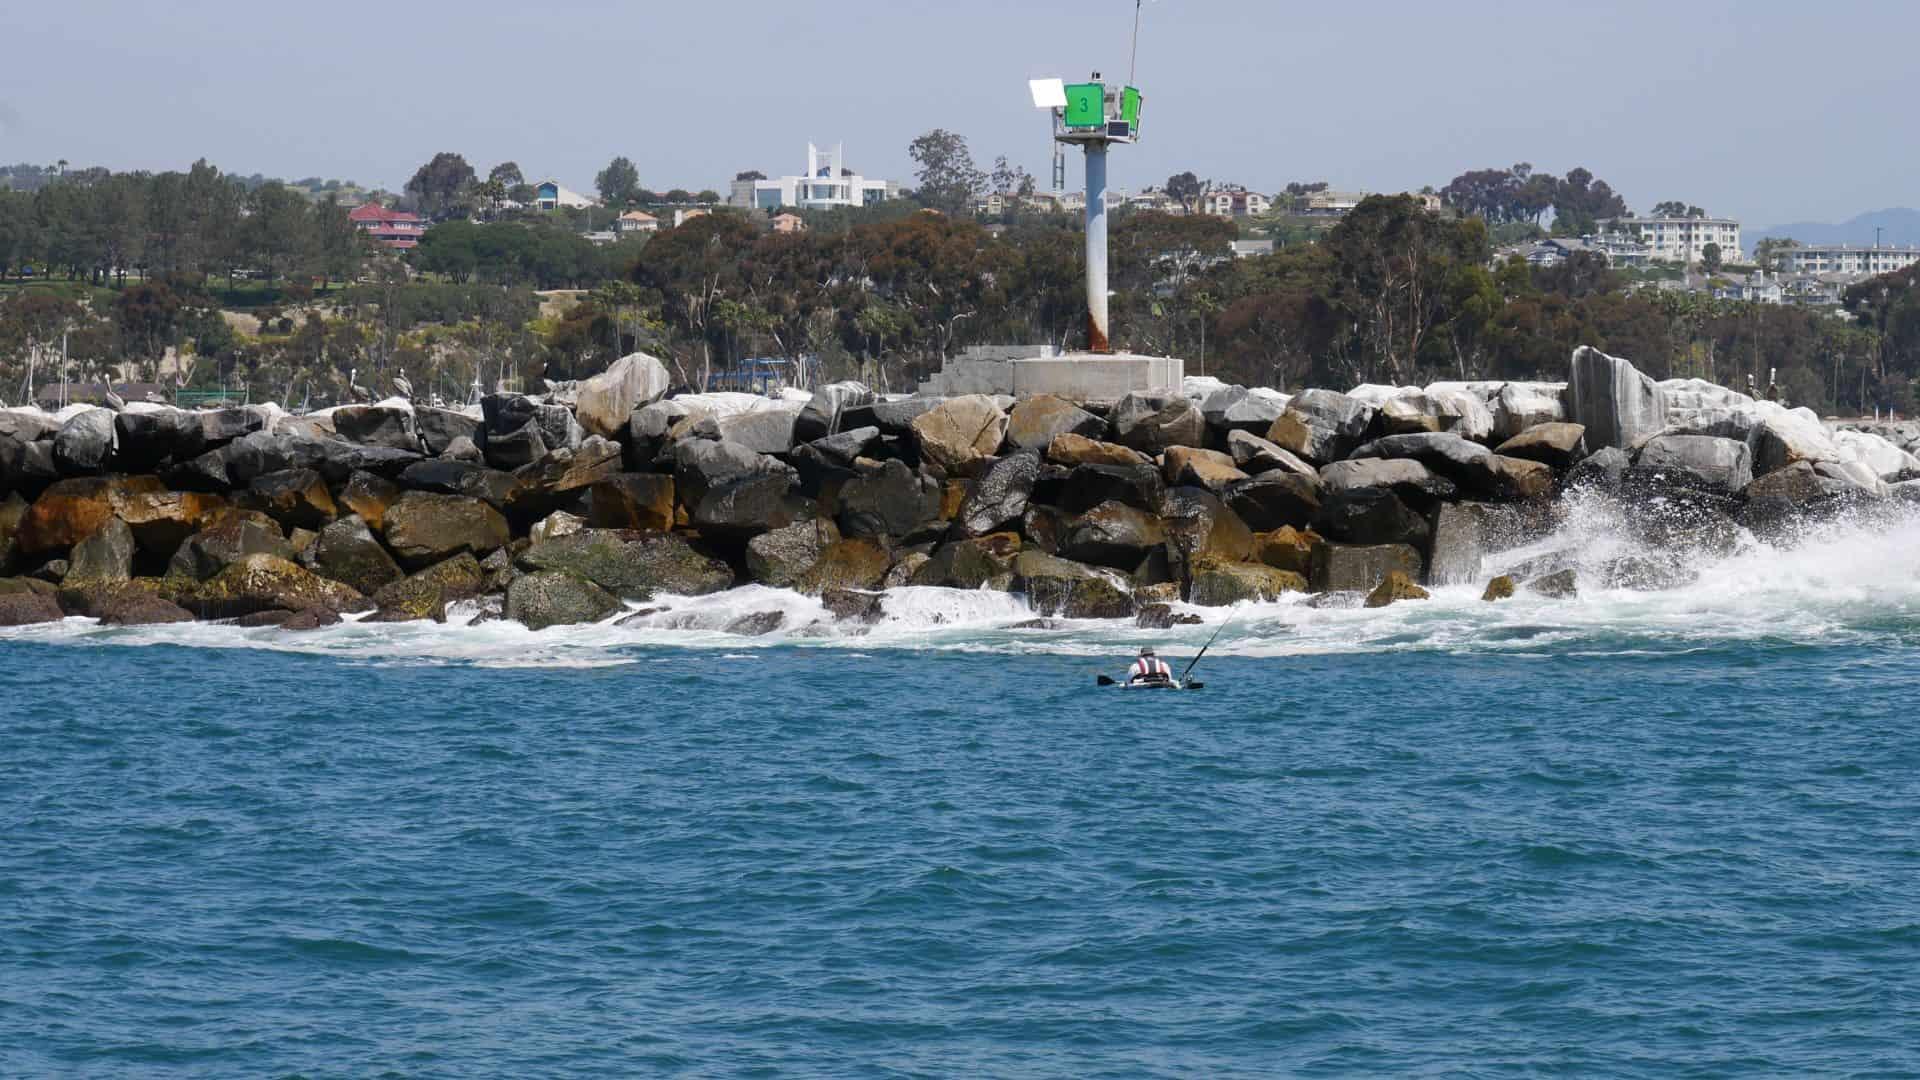 Kayaker fishing near the breakwater